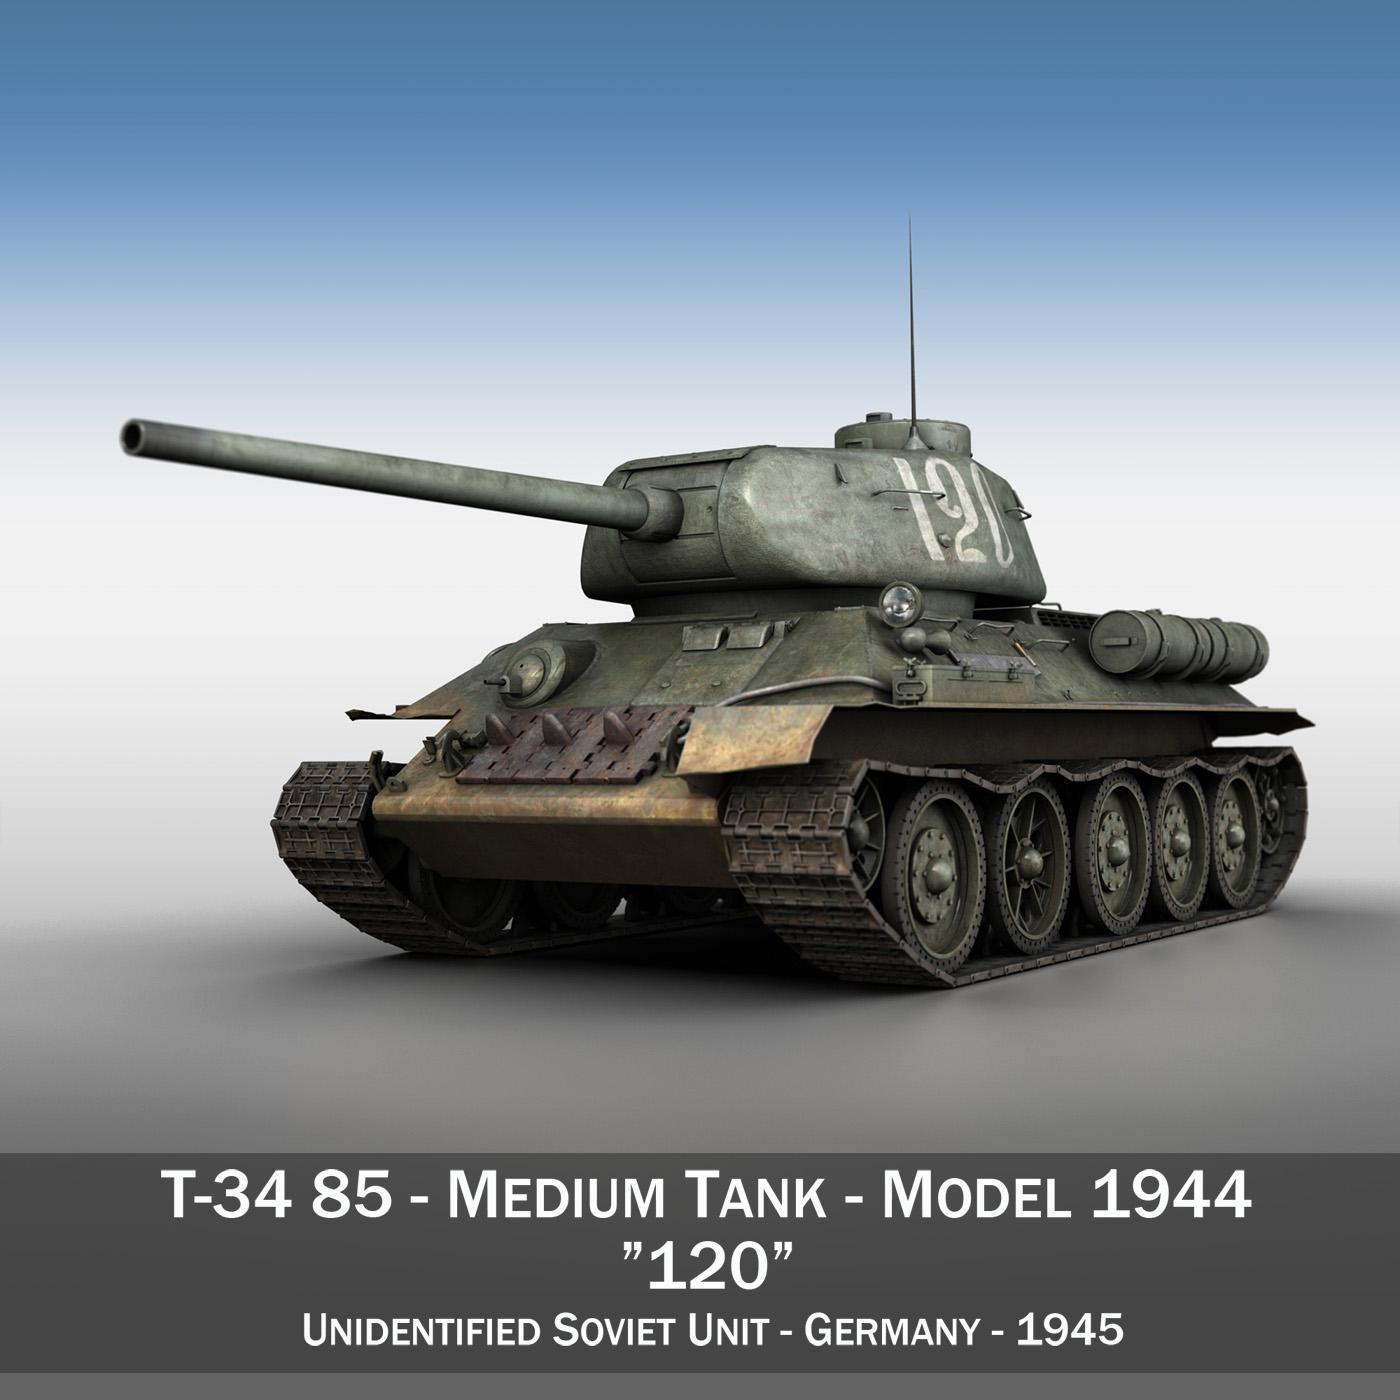 t-34 85 - padomju vidēja tvertne - 120 3d modelis 3ds fwx lws lws obj c4d 265369